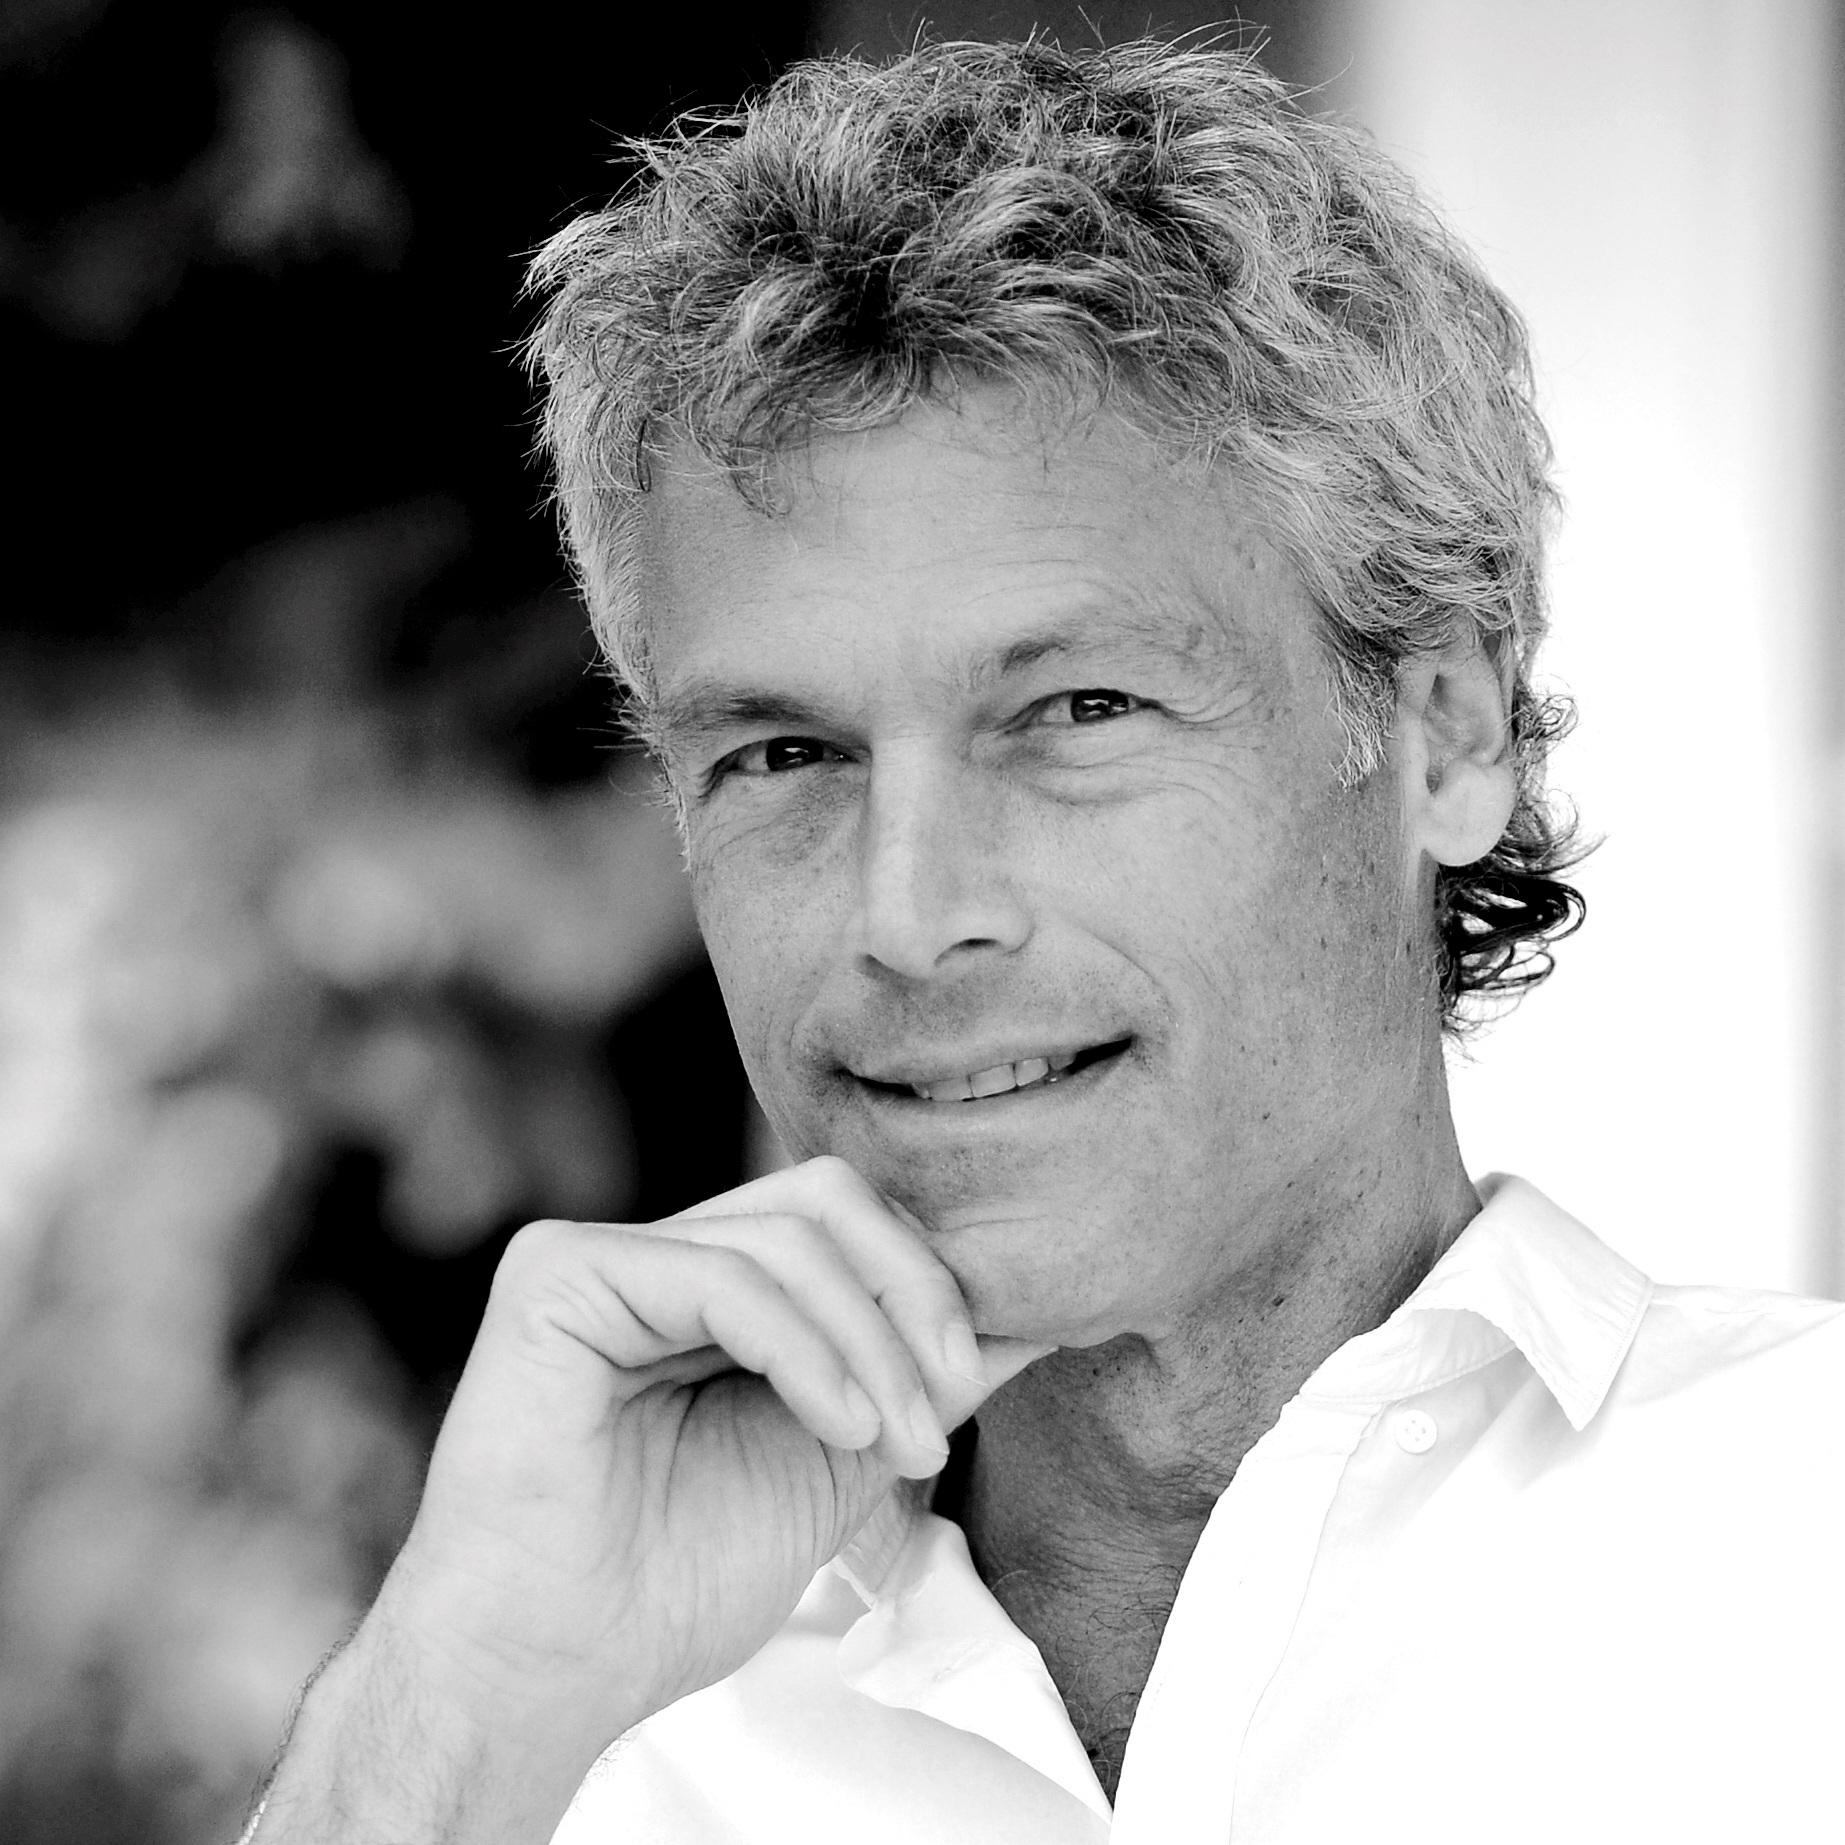 PD Dr. phil. Roger Hofer  Philosophie am Obertor  Winterthur / Schweiz